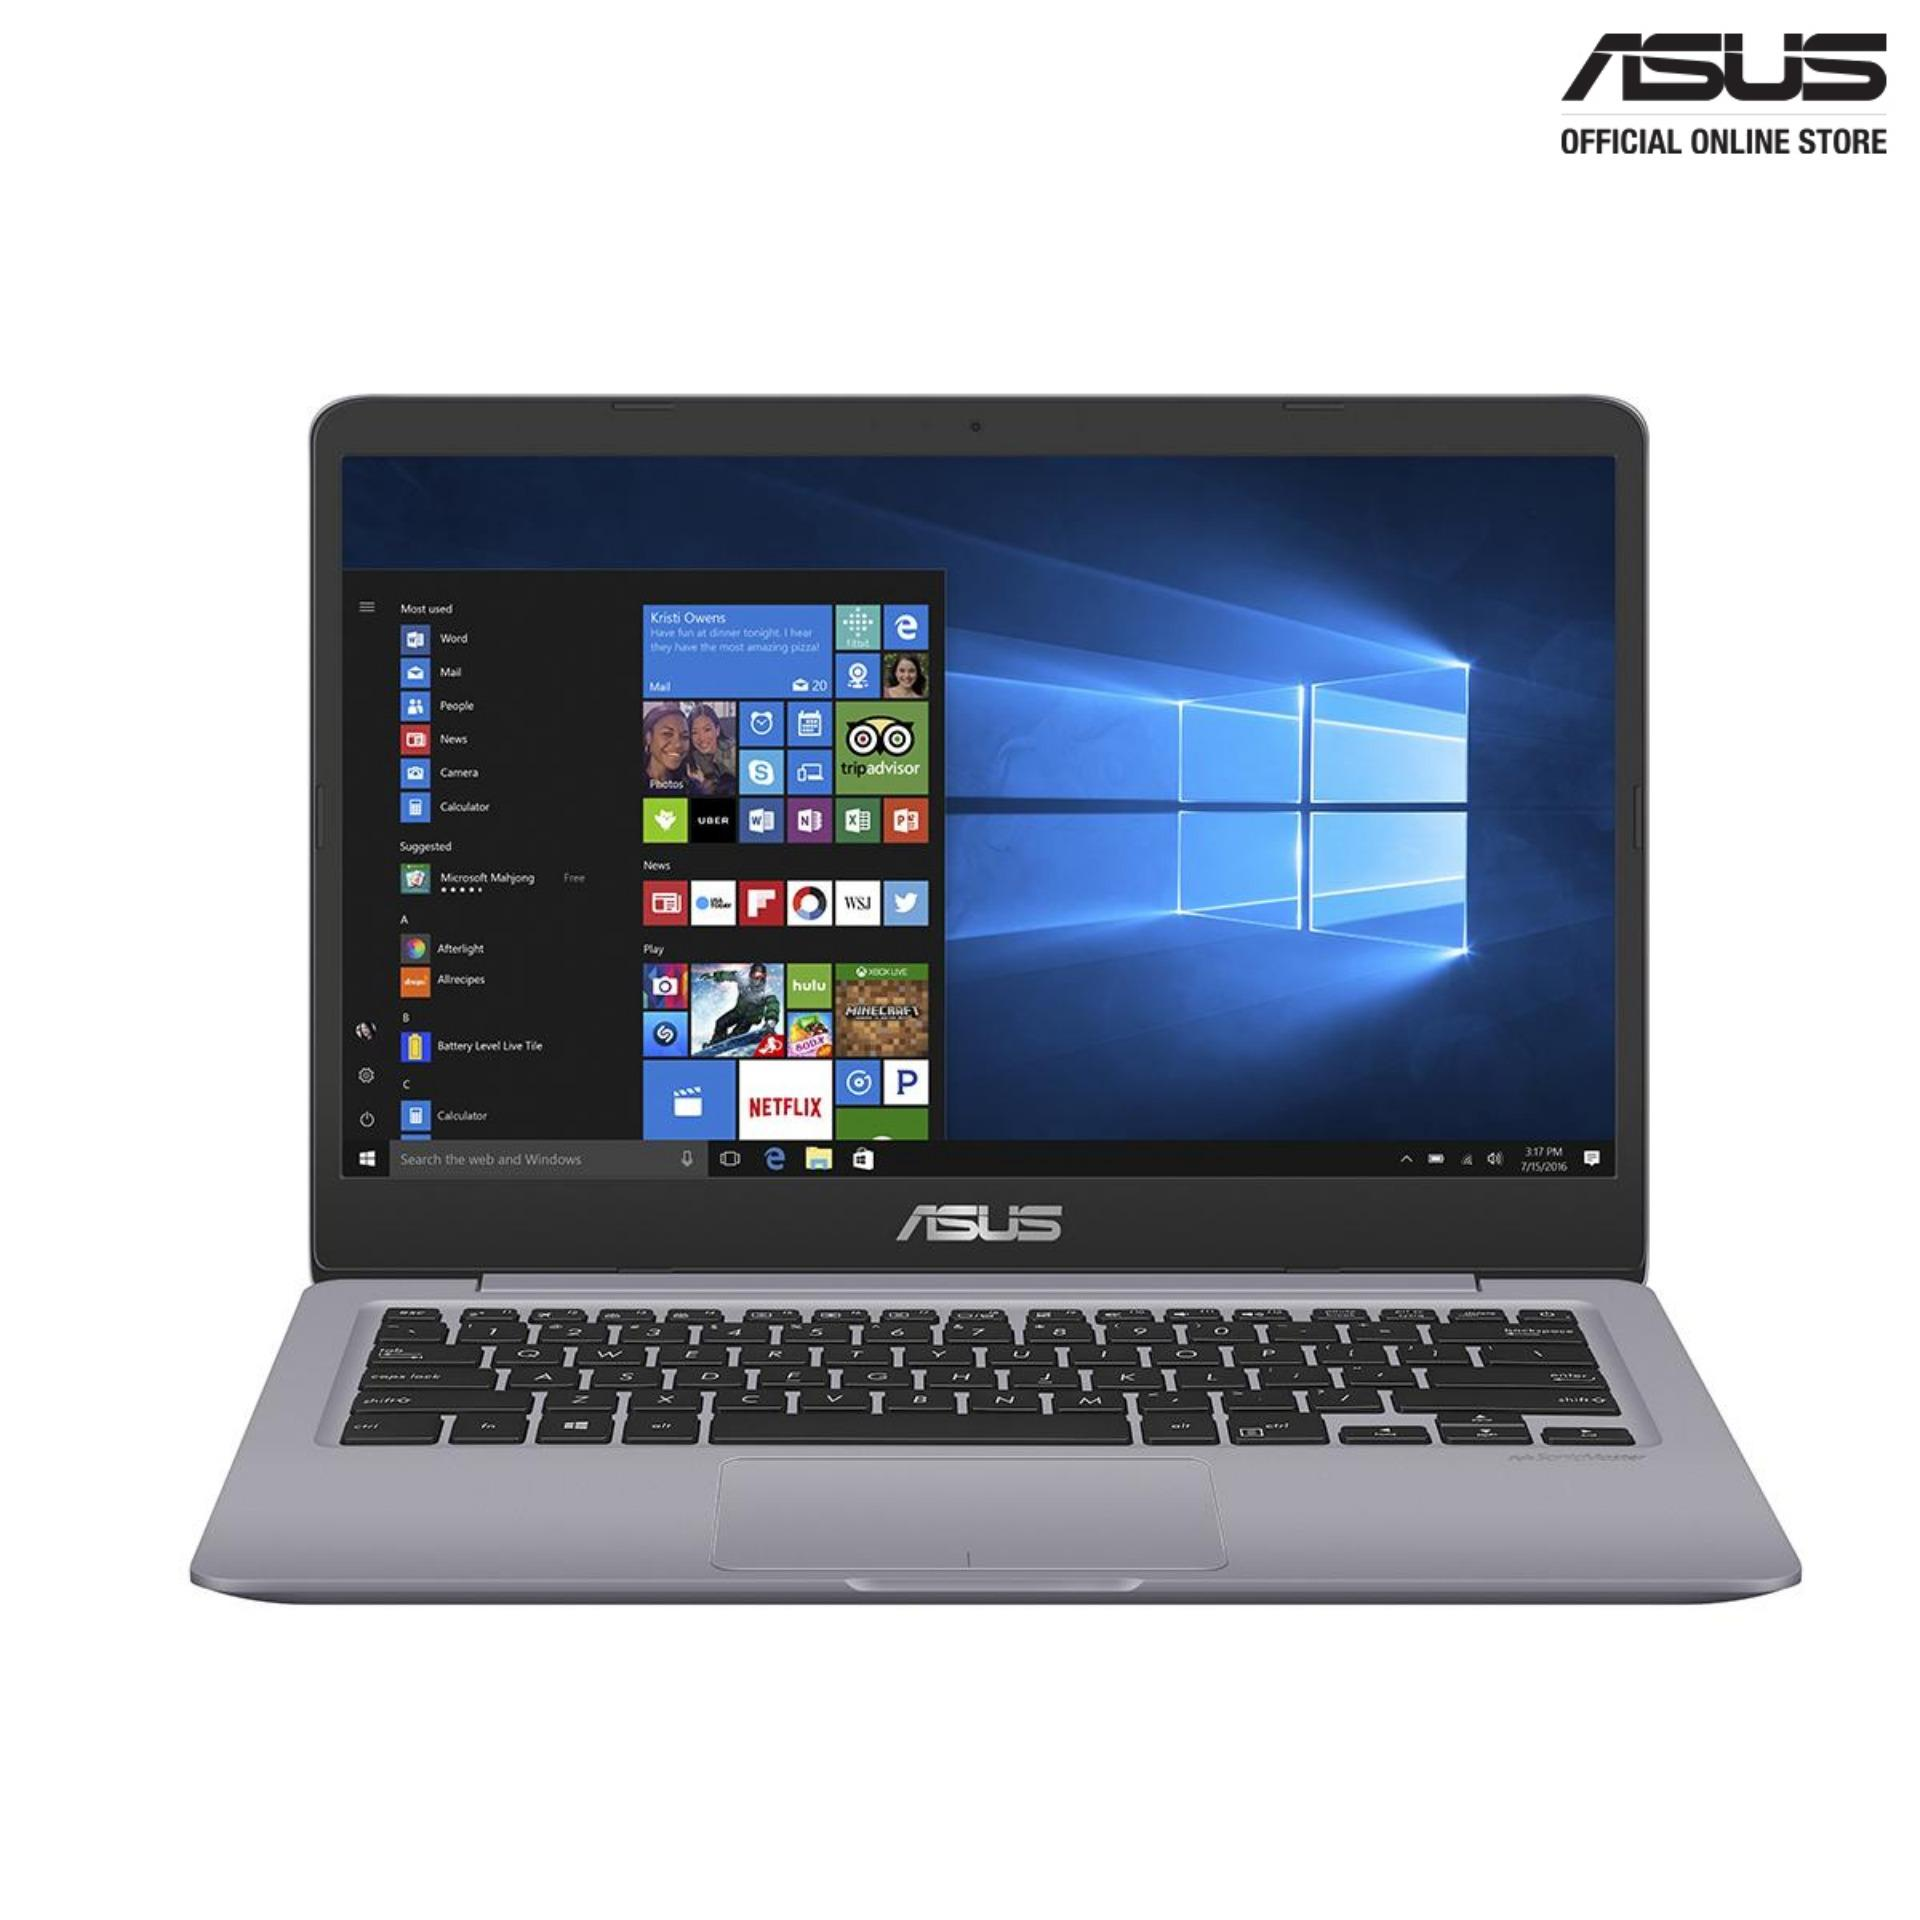 ASUS VivoBook S410UN-EB146TS (Star Grey)